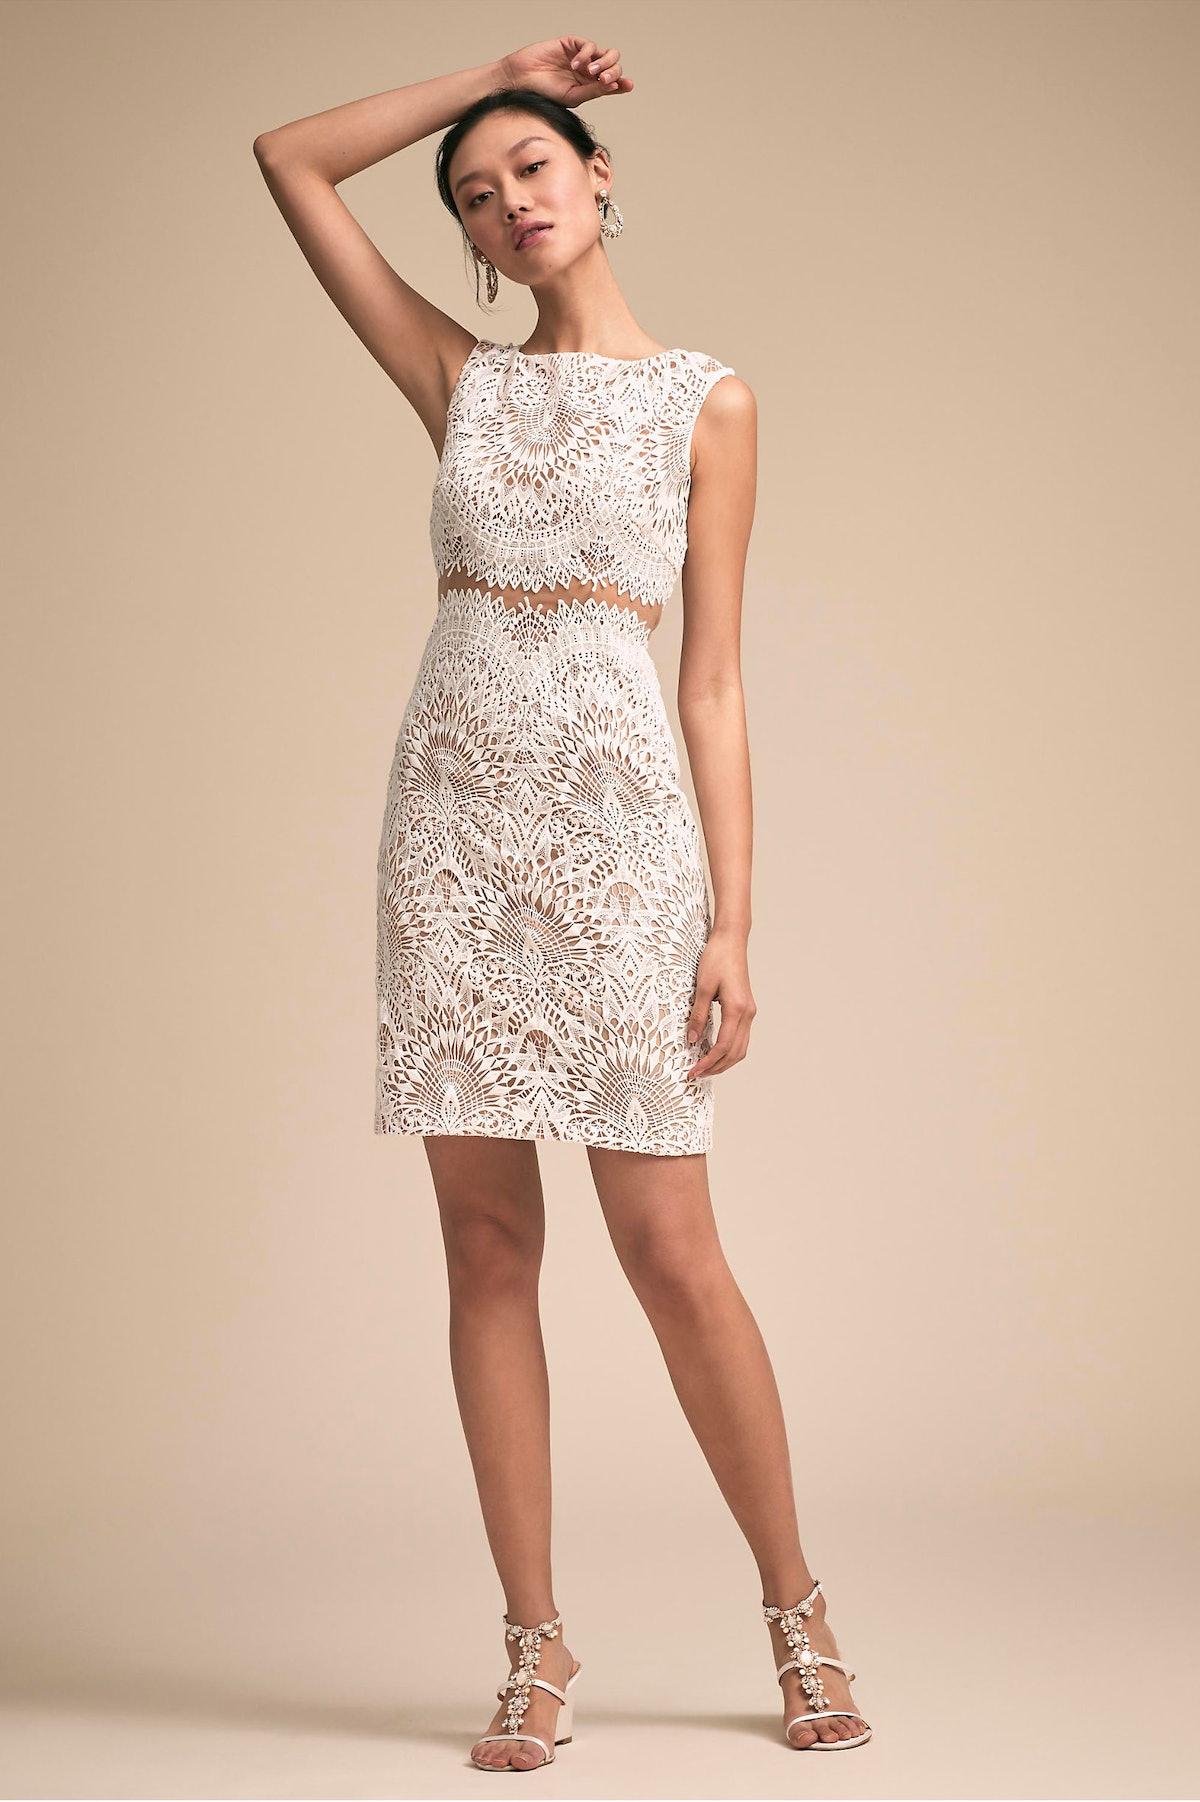 Sparks Fly Dress